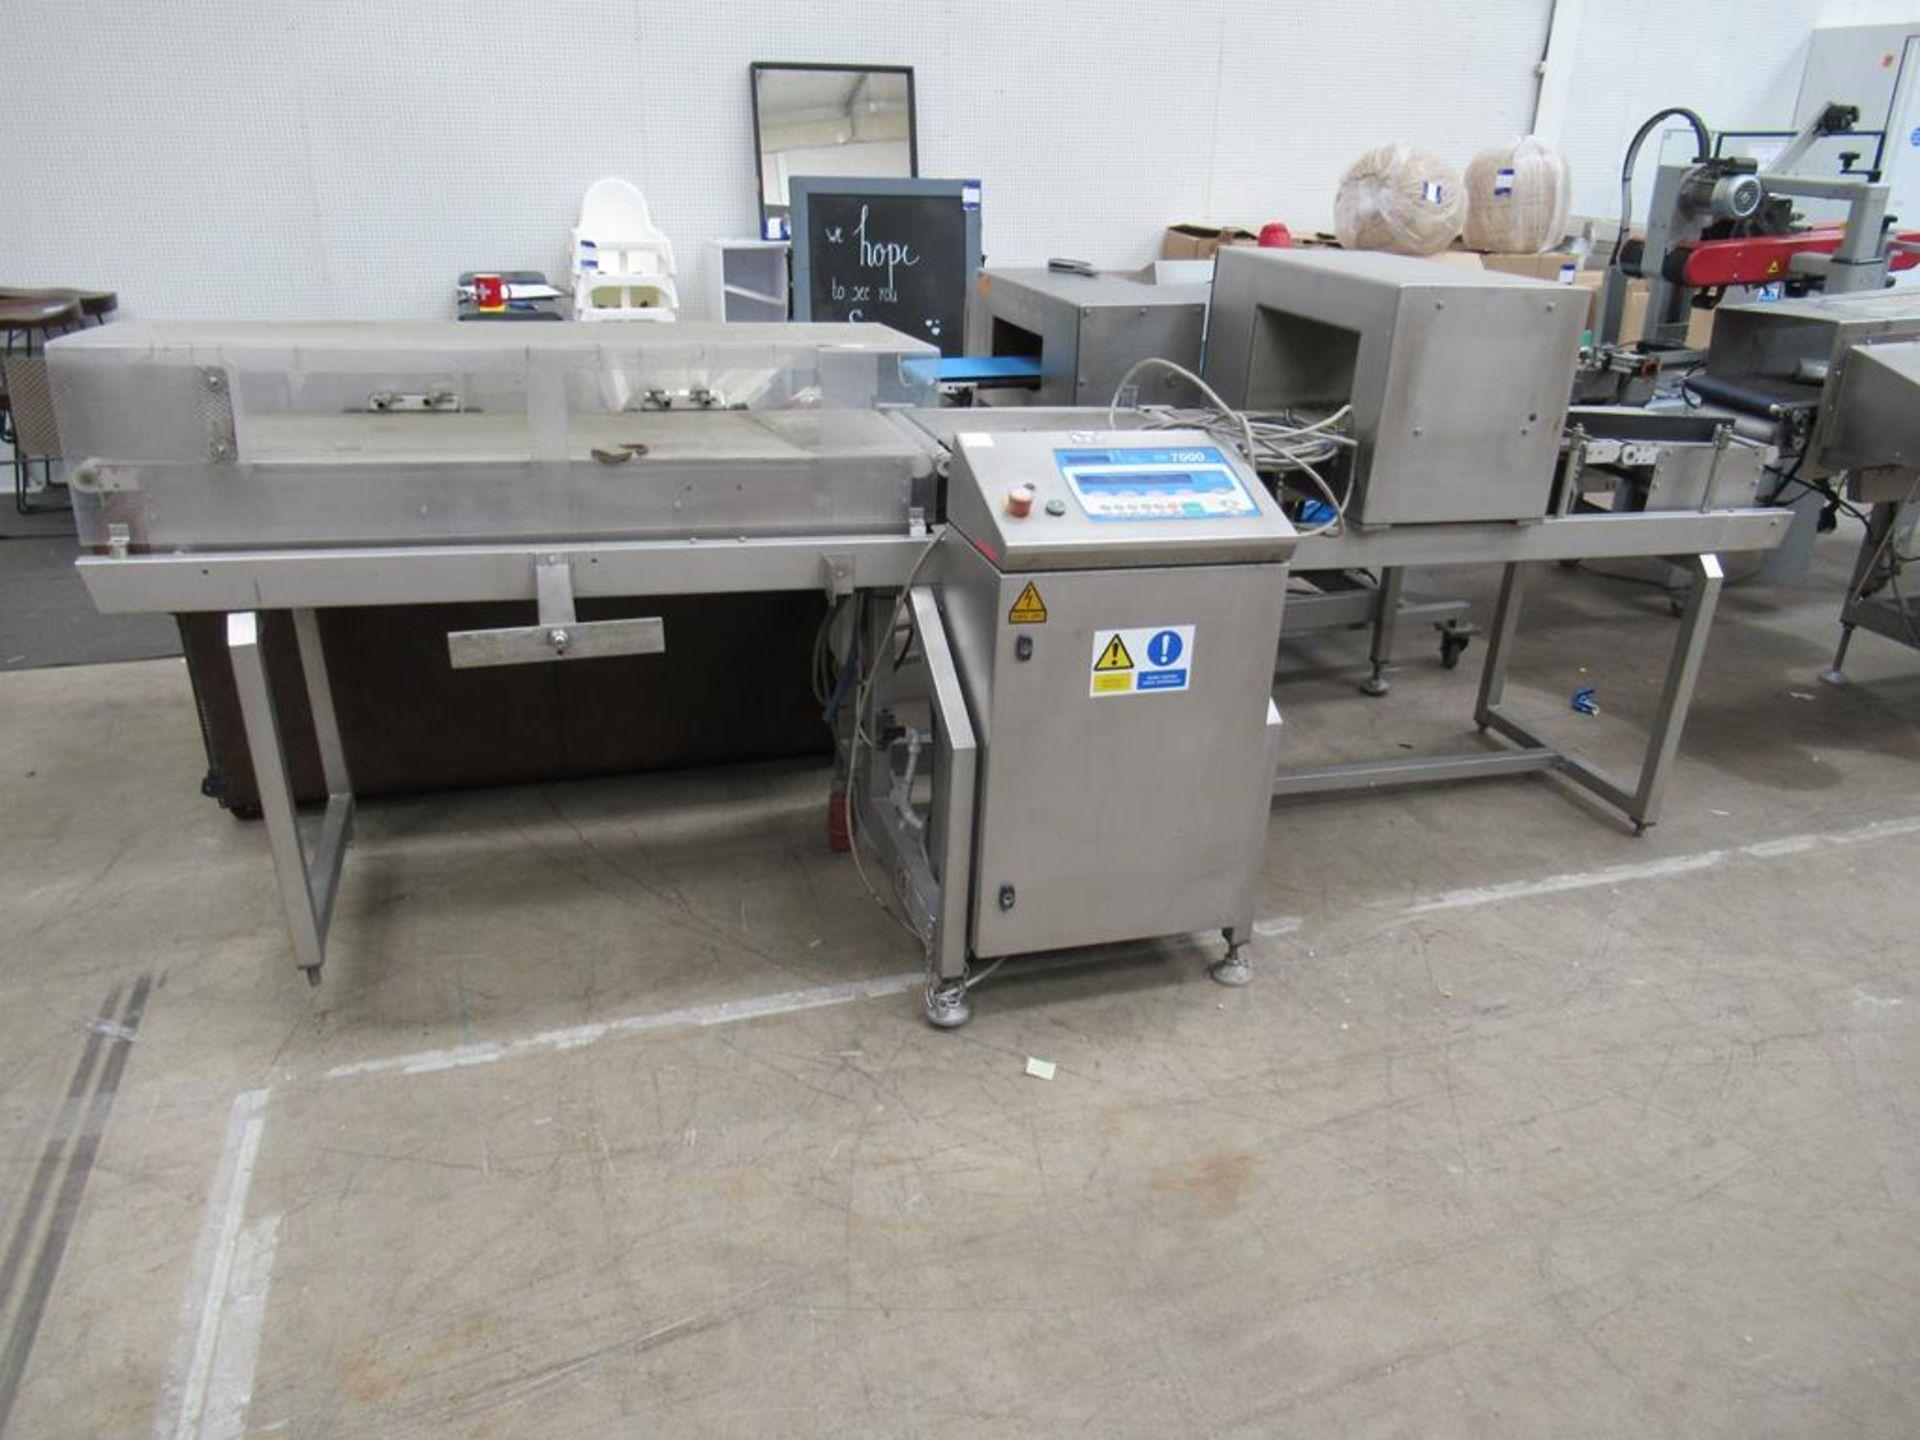 Loma 7000 Metal Detecting Conveyor